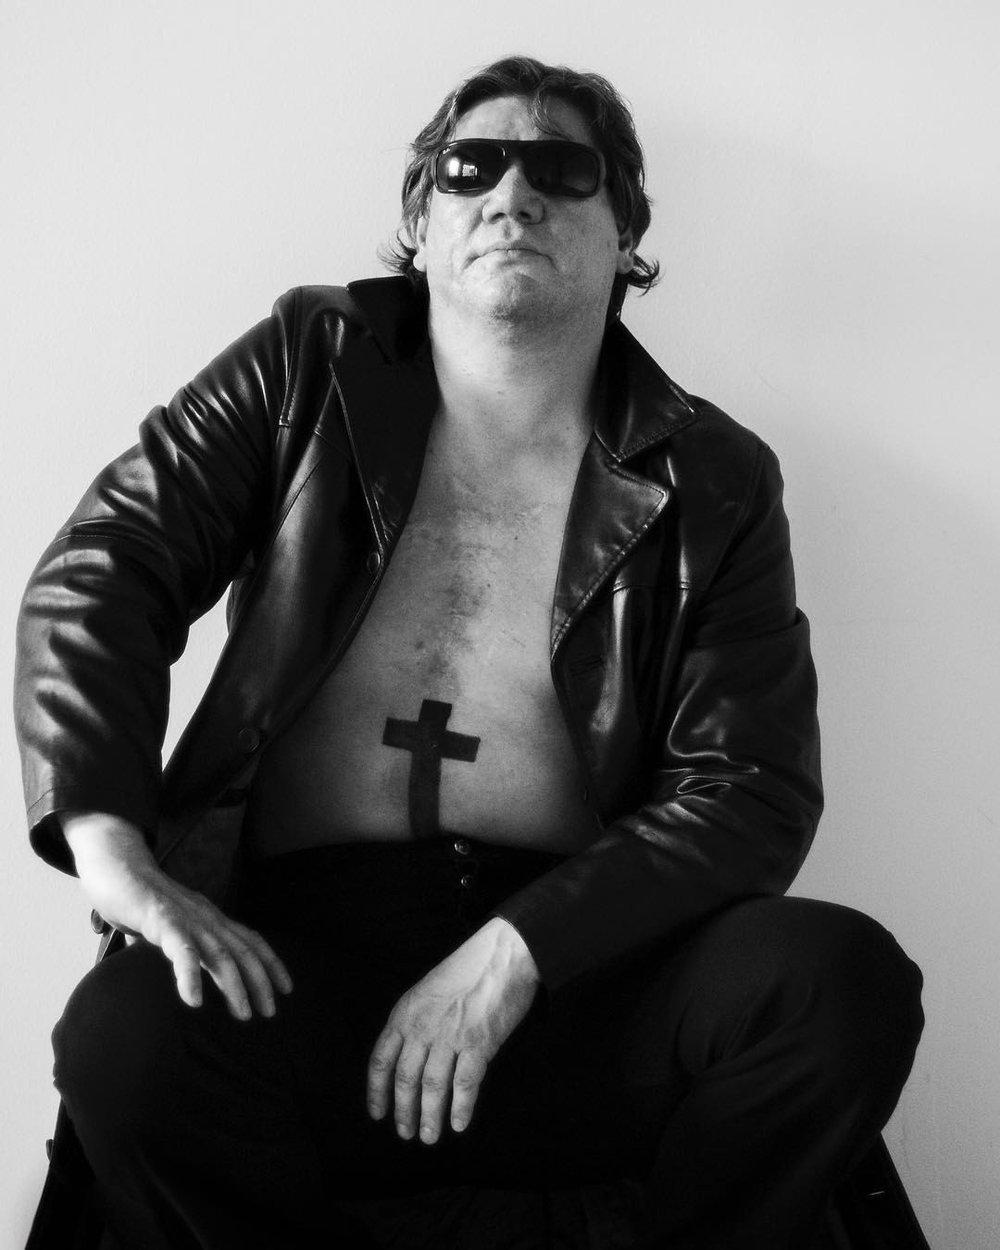 Claude-Oliver Rudolph. Actor.   #portraitphotography #portrait #blackandwhitephotography #actor #setlife